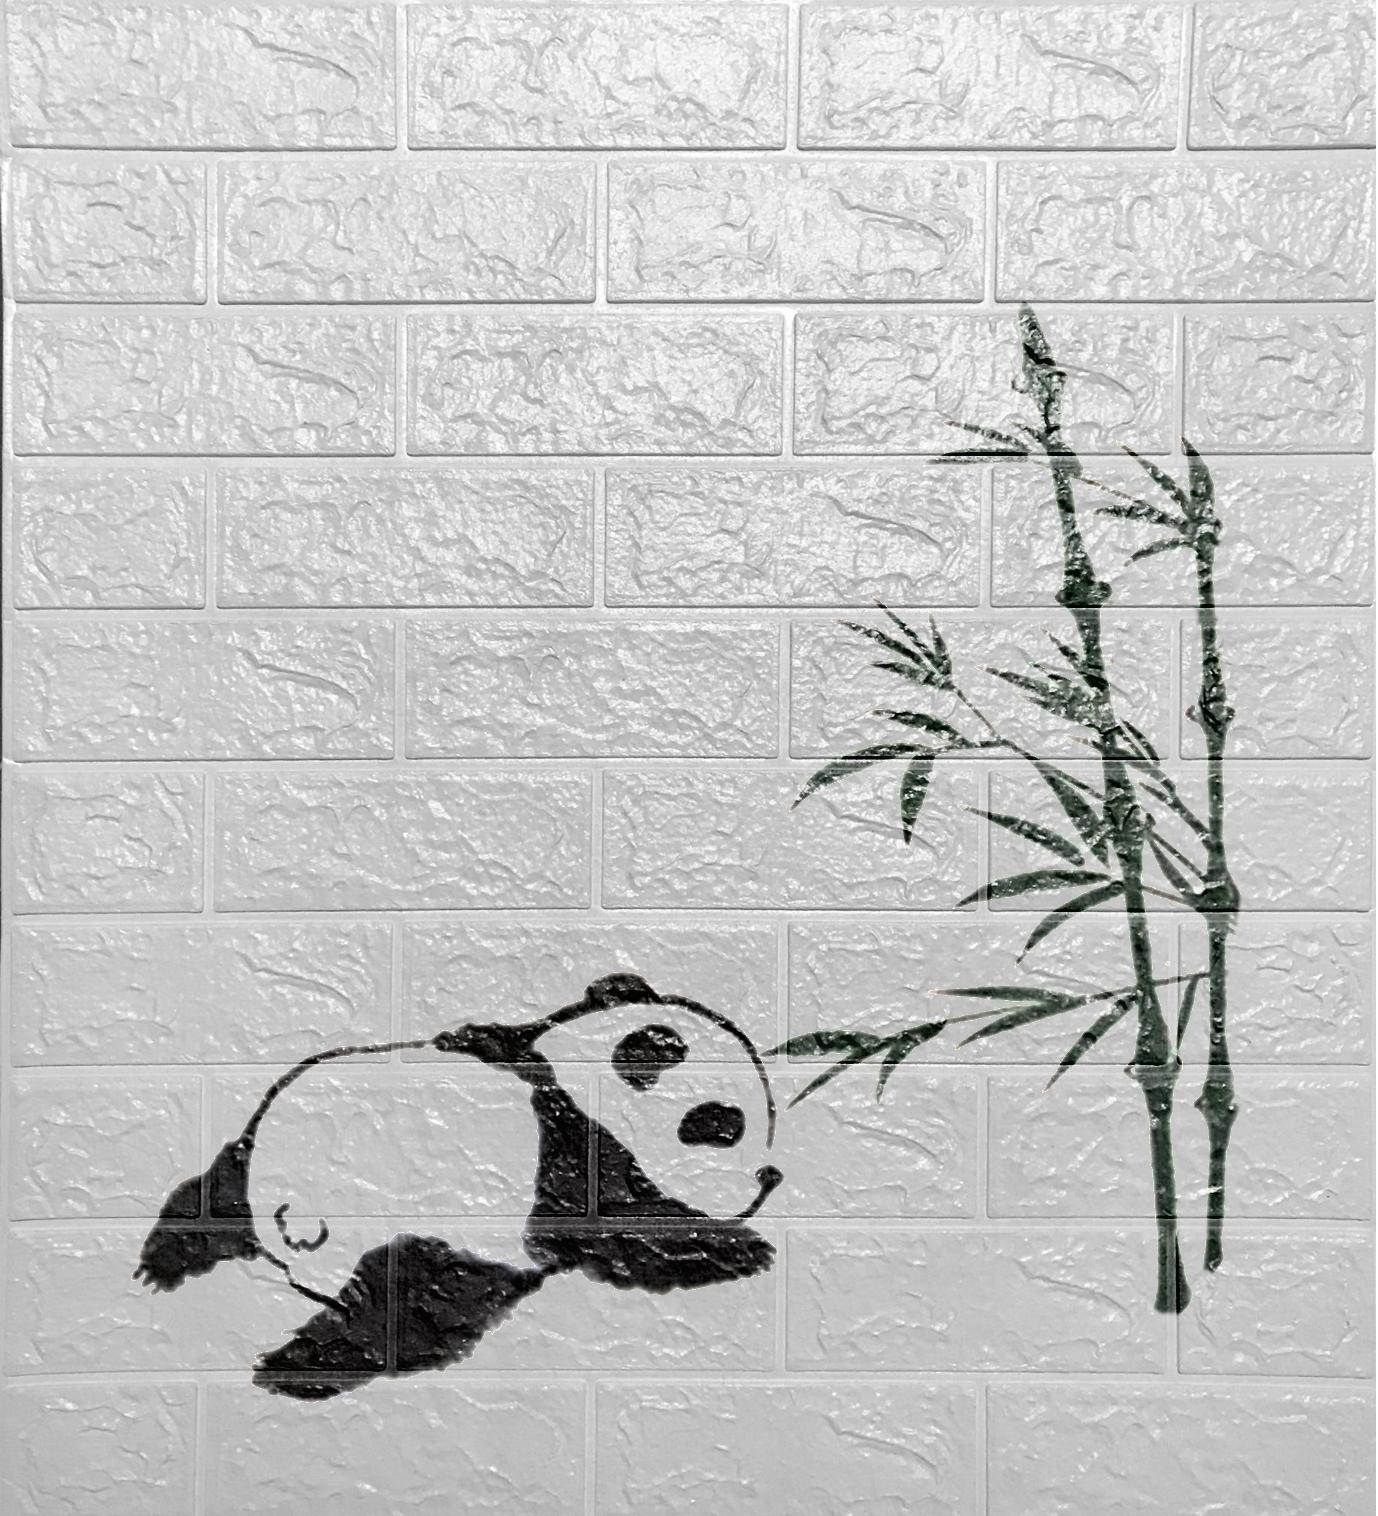 Pabrik Grosir Baru 3d Lucu Panda Wallpaper Kamar Anak Perekat Diri Wallpaper Tahan Air Buy 3d Wallpaper 3d Wallpaper Kamar Anak Perekat Wallpaper Product On Alibaba Com